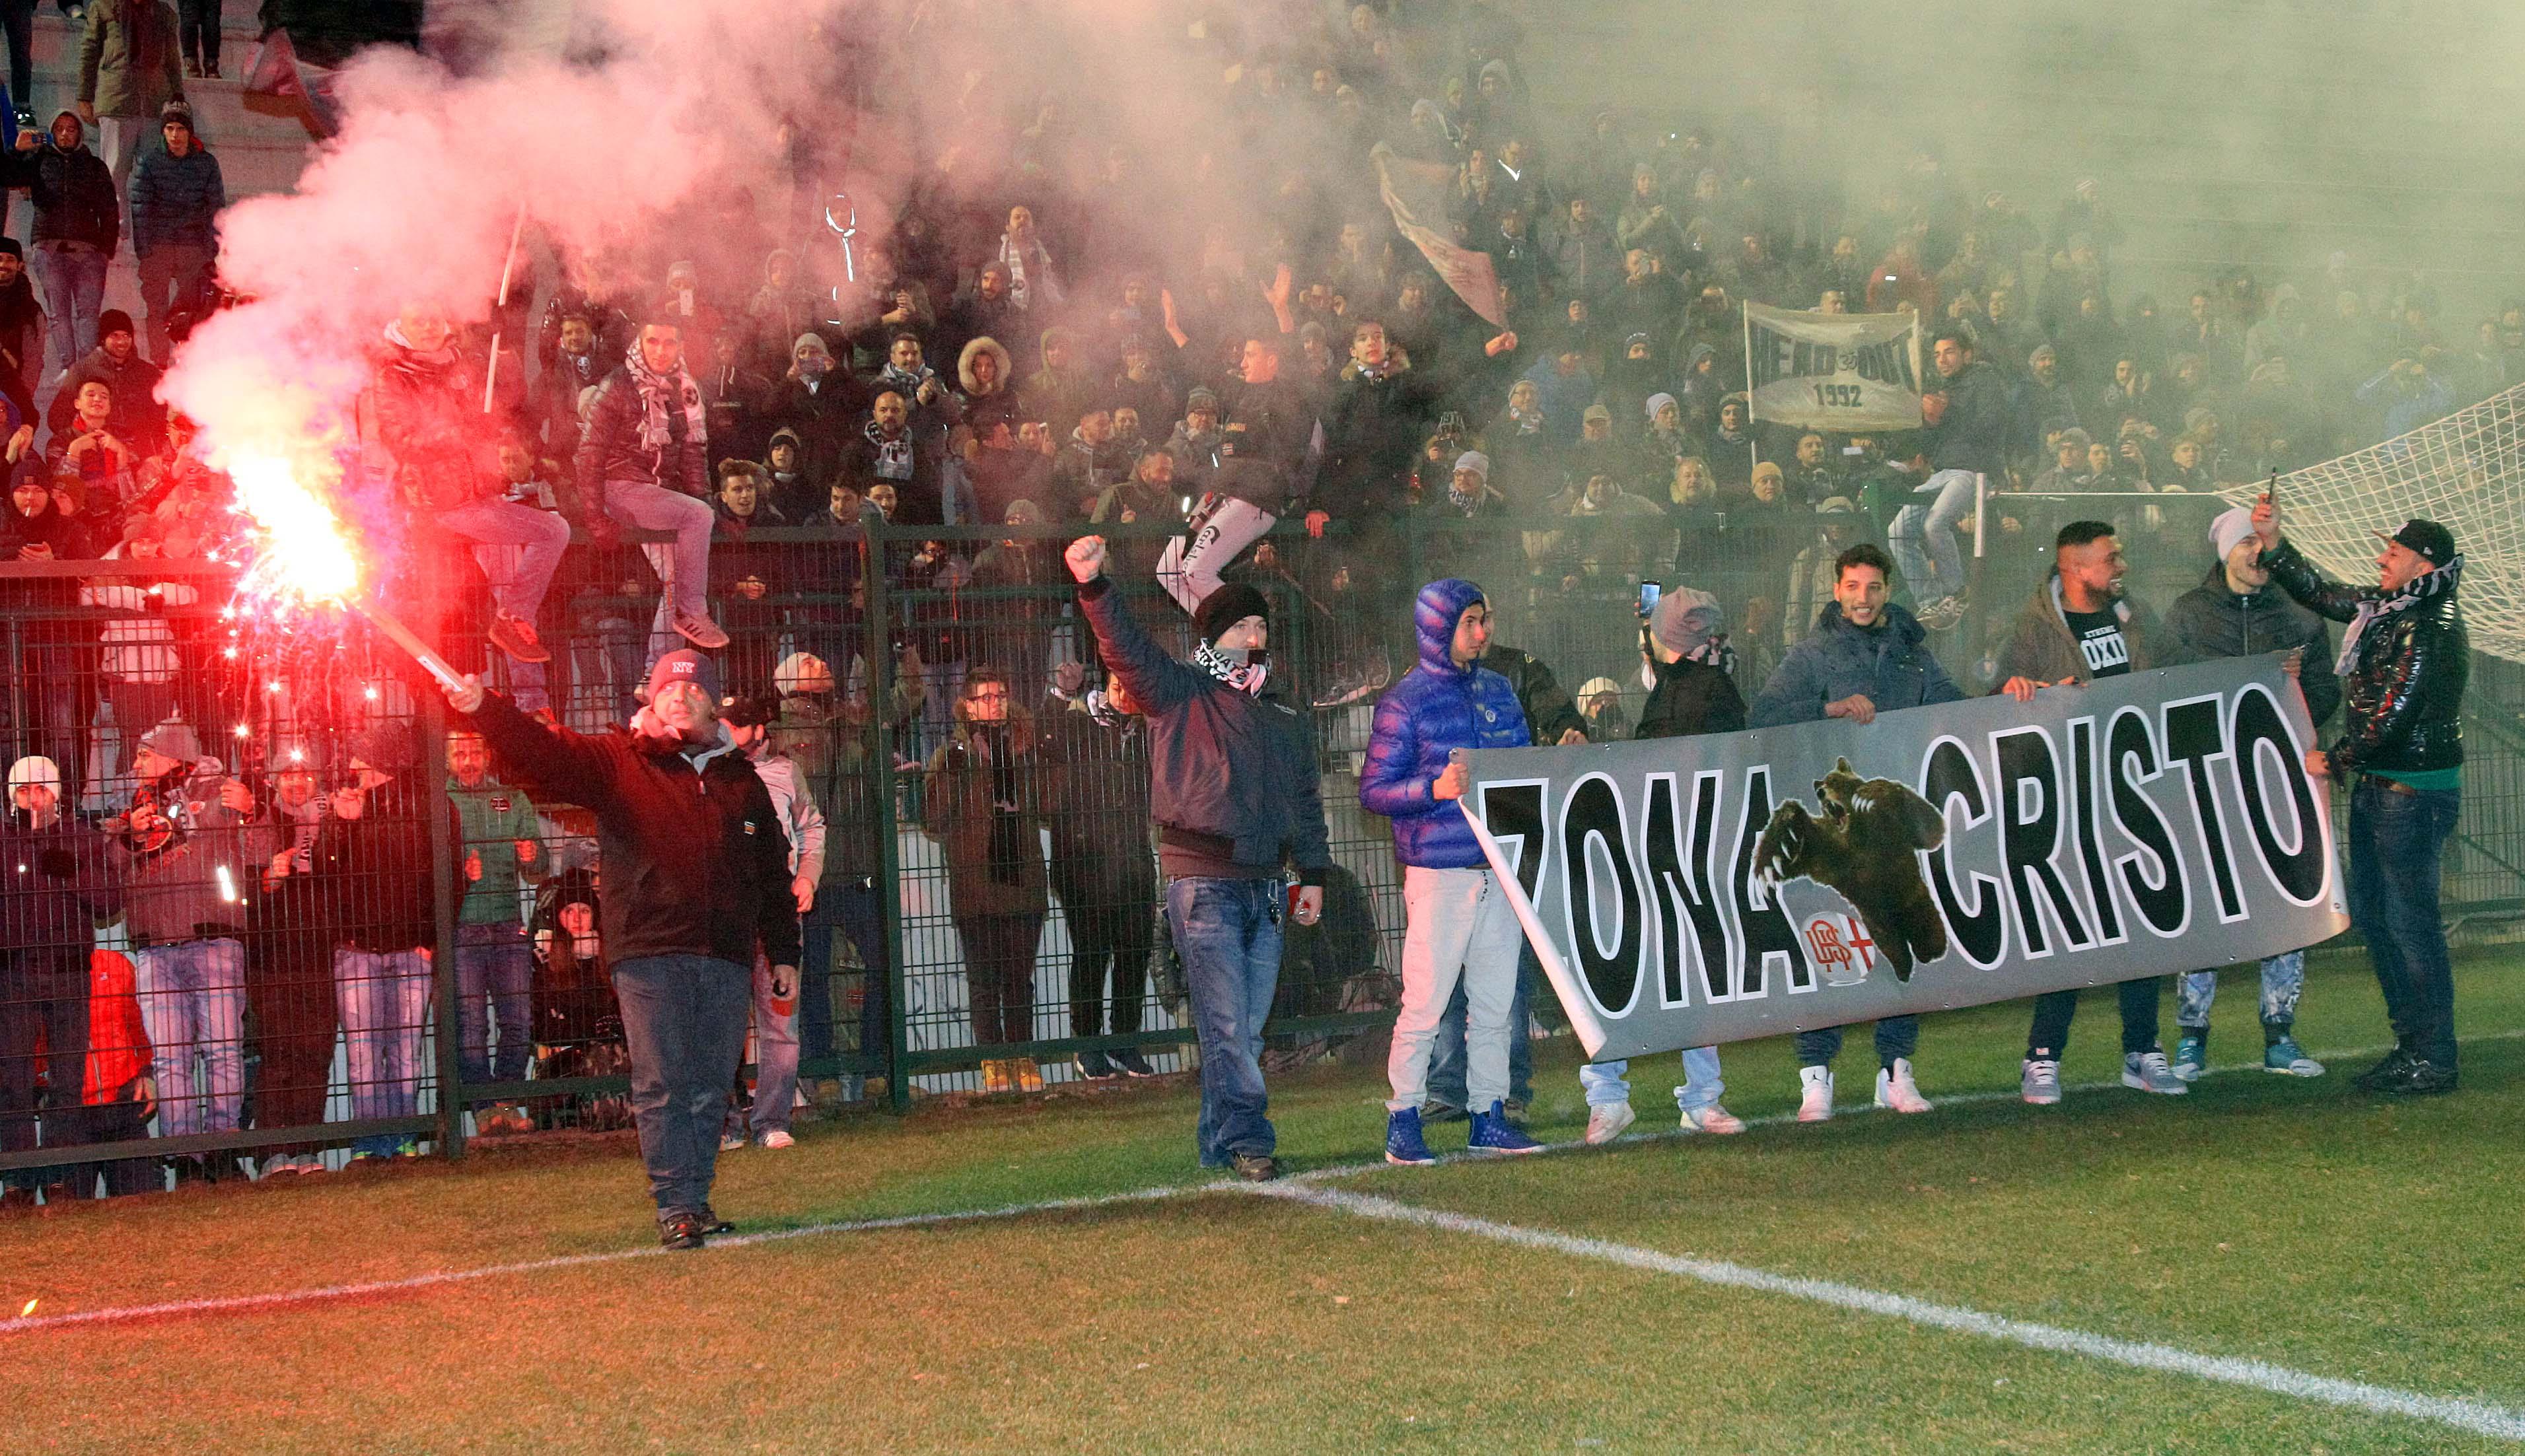 Alessandria, Spezia-Grigi - tifosi in festa (b. 63) Immagine Spezia-Grigi festa stadio021.JPG da dimafoal host ALE2 @autore FEDCAS